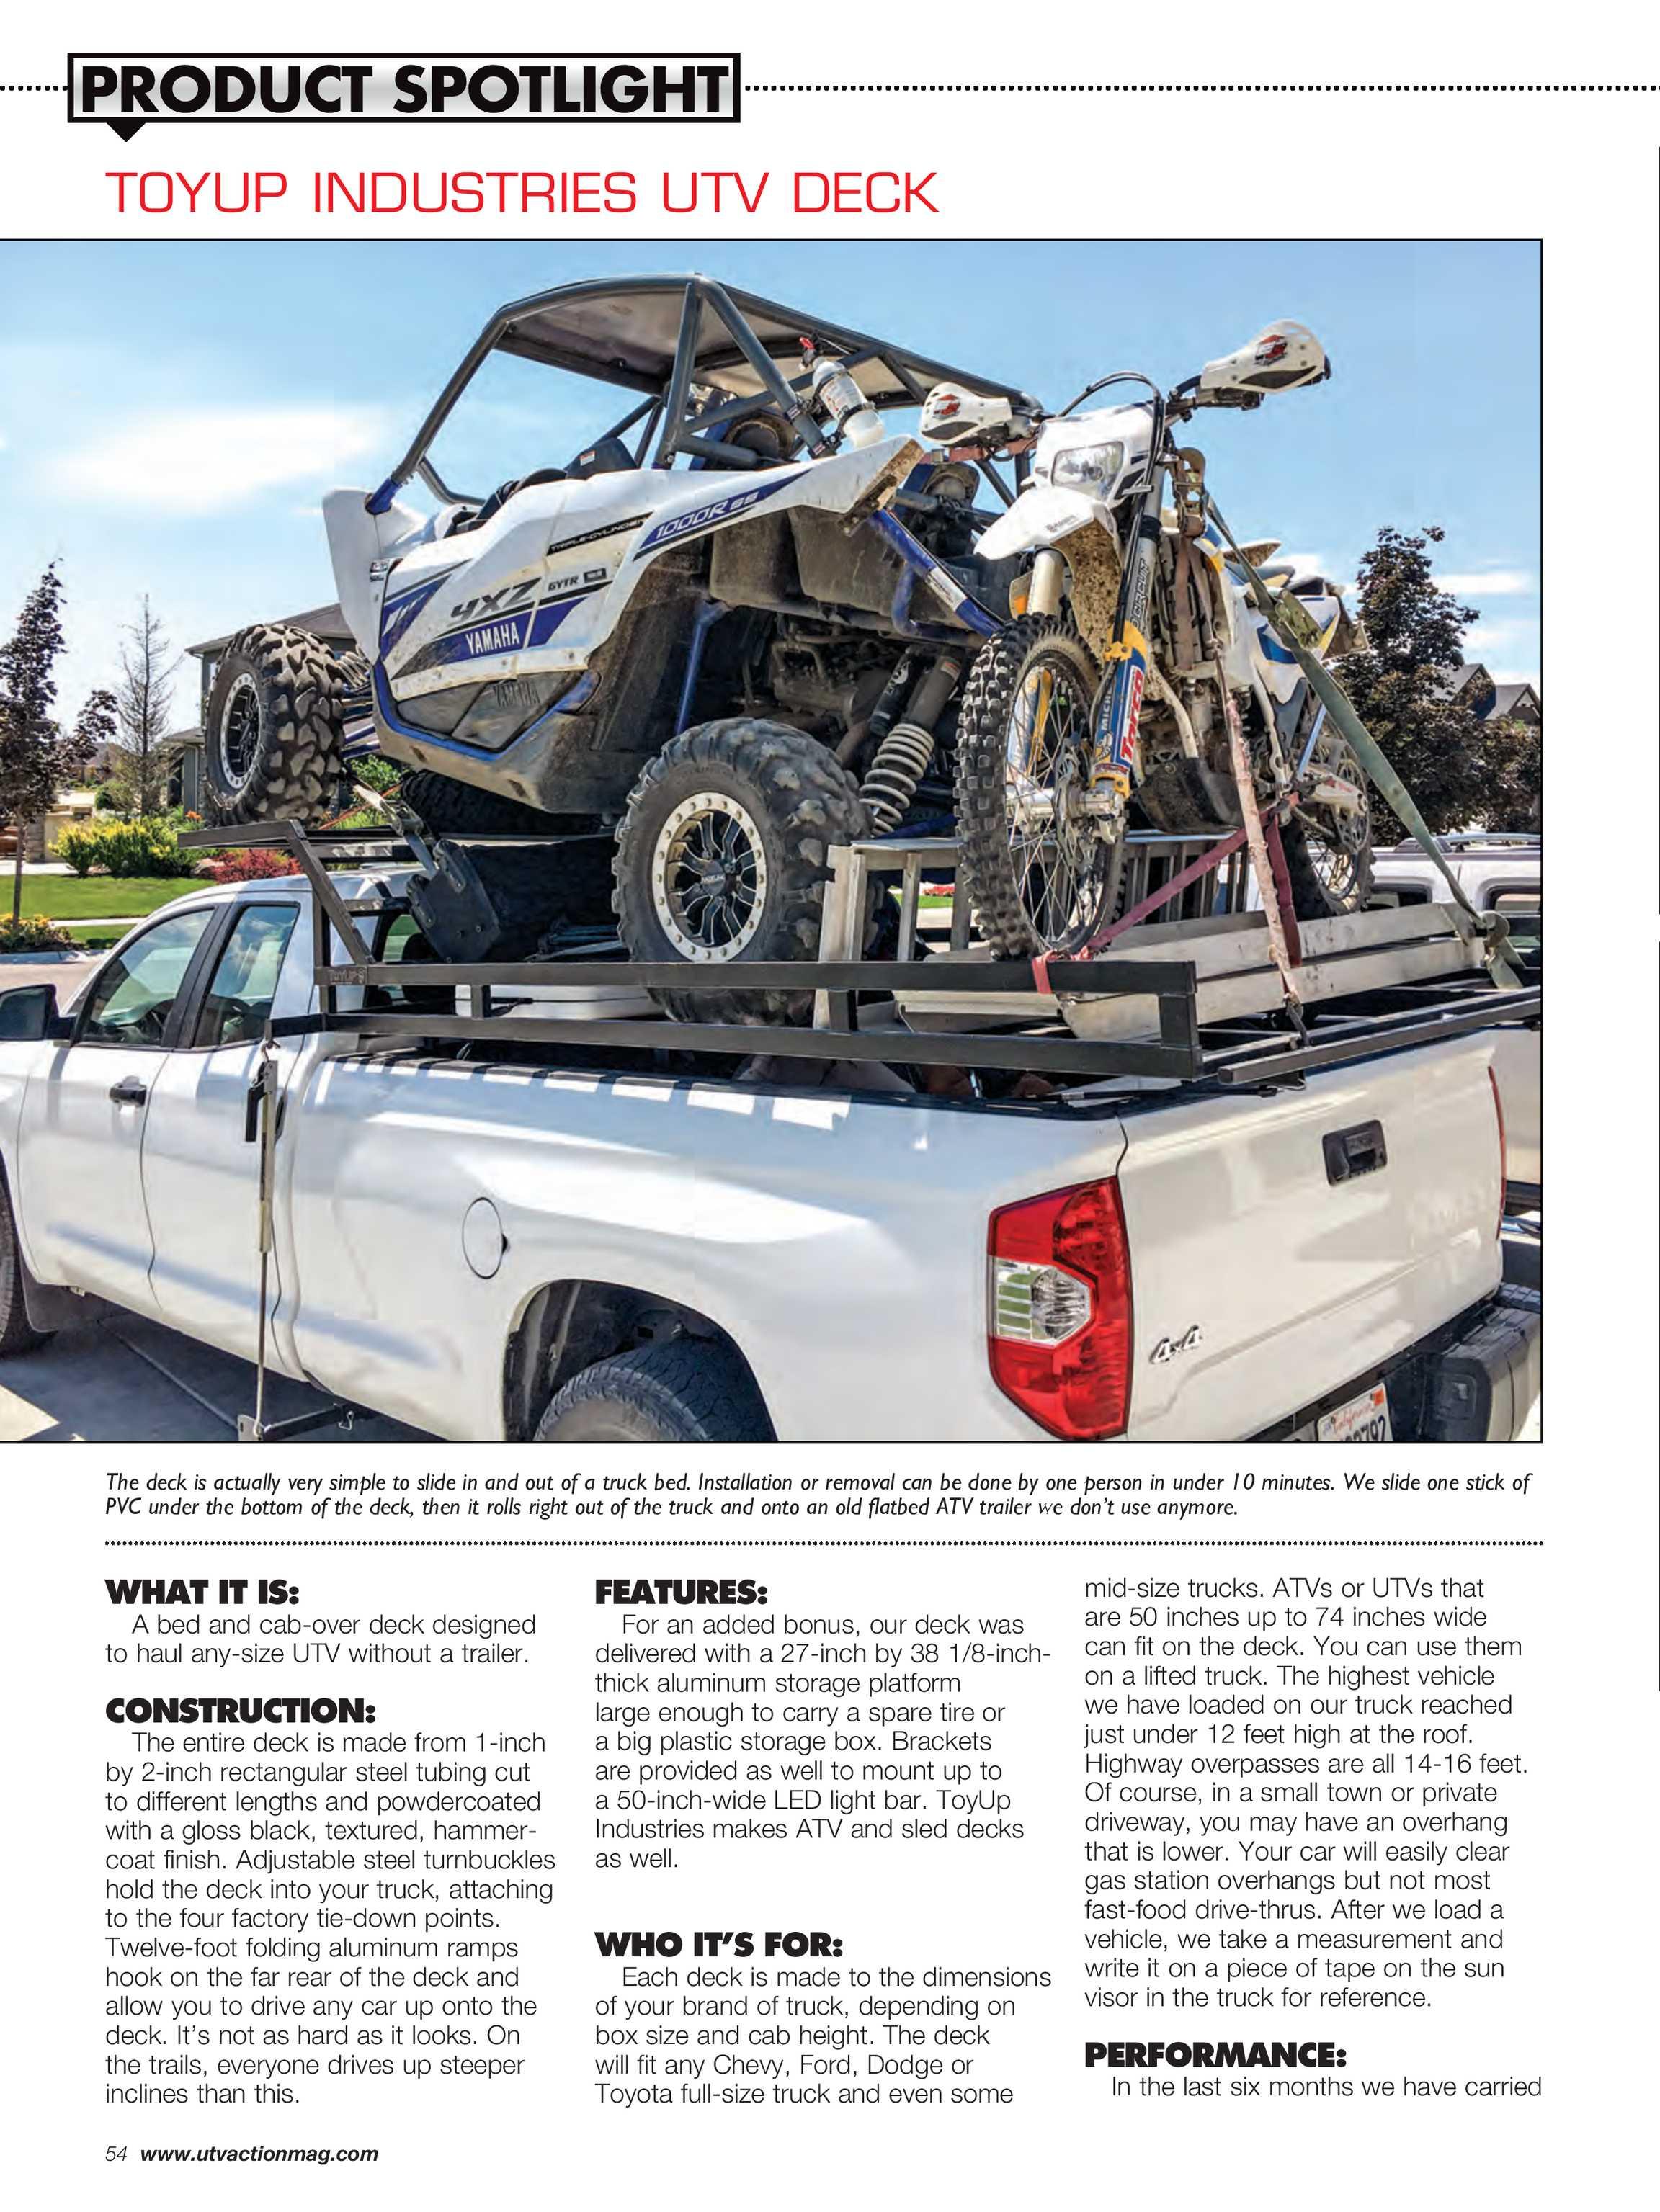 UTV Action Magazine - August, 2018 - page 54